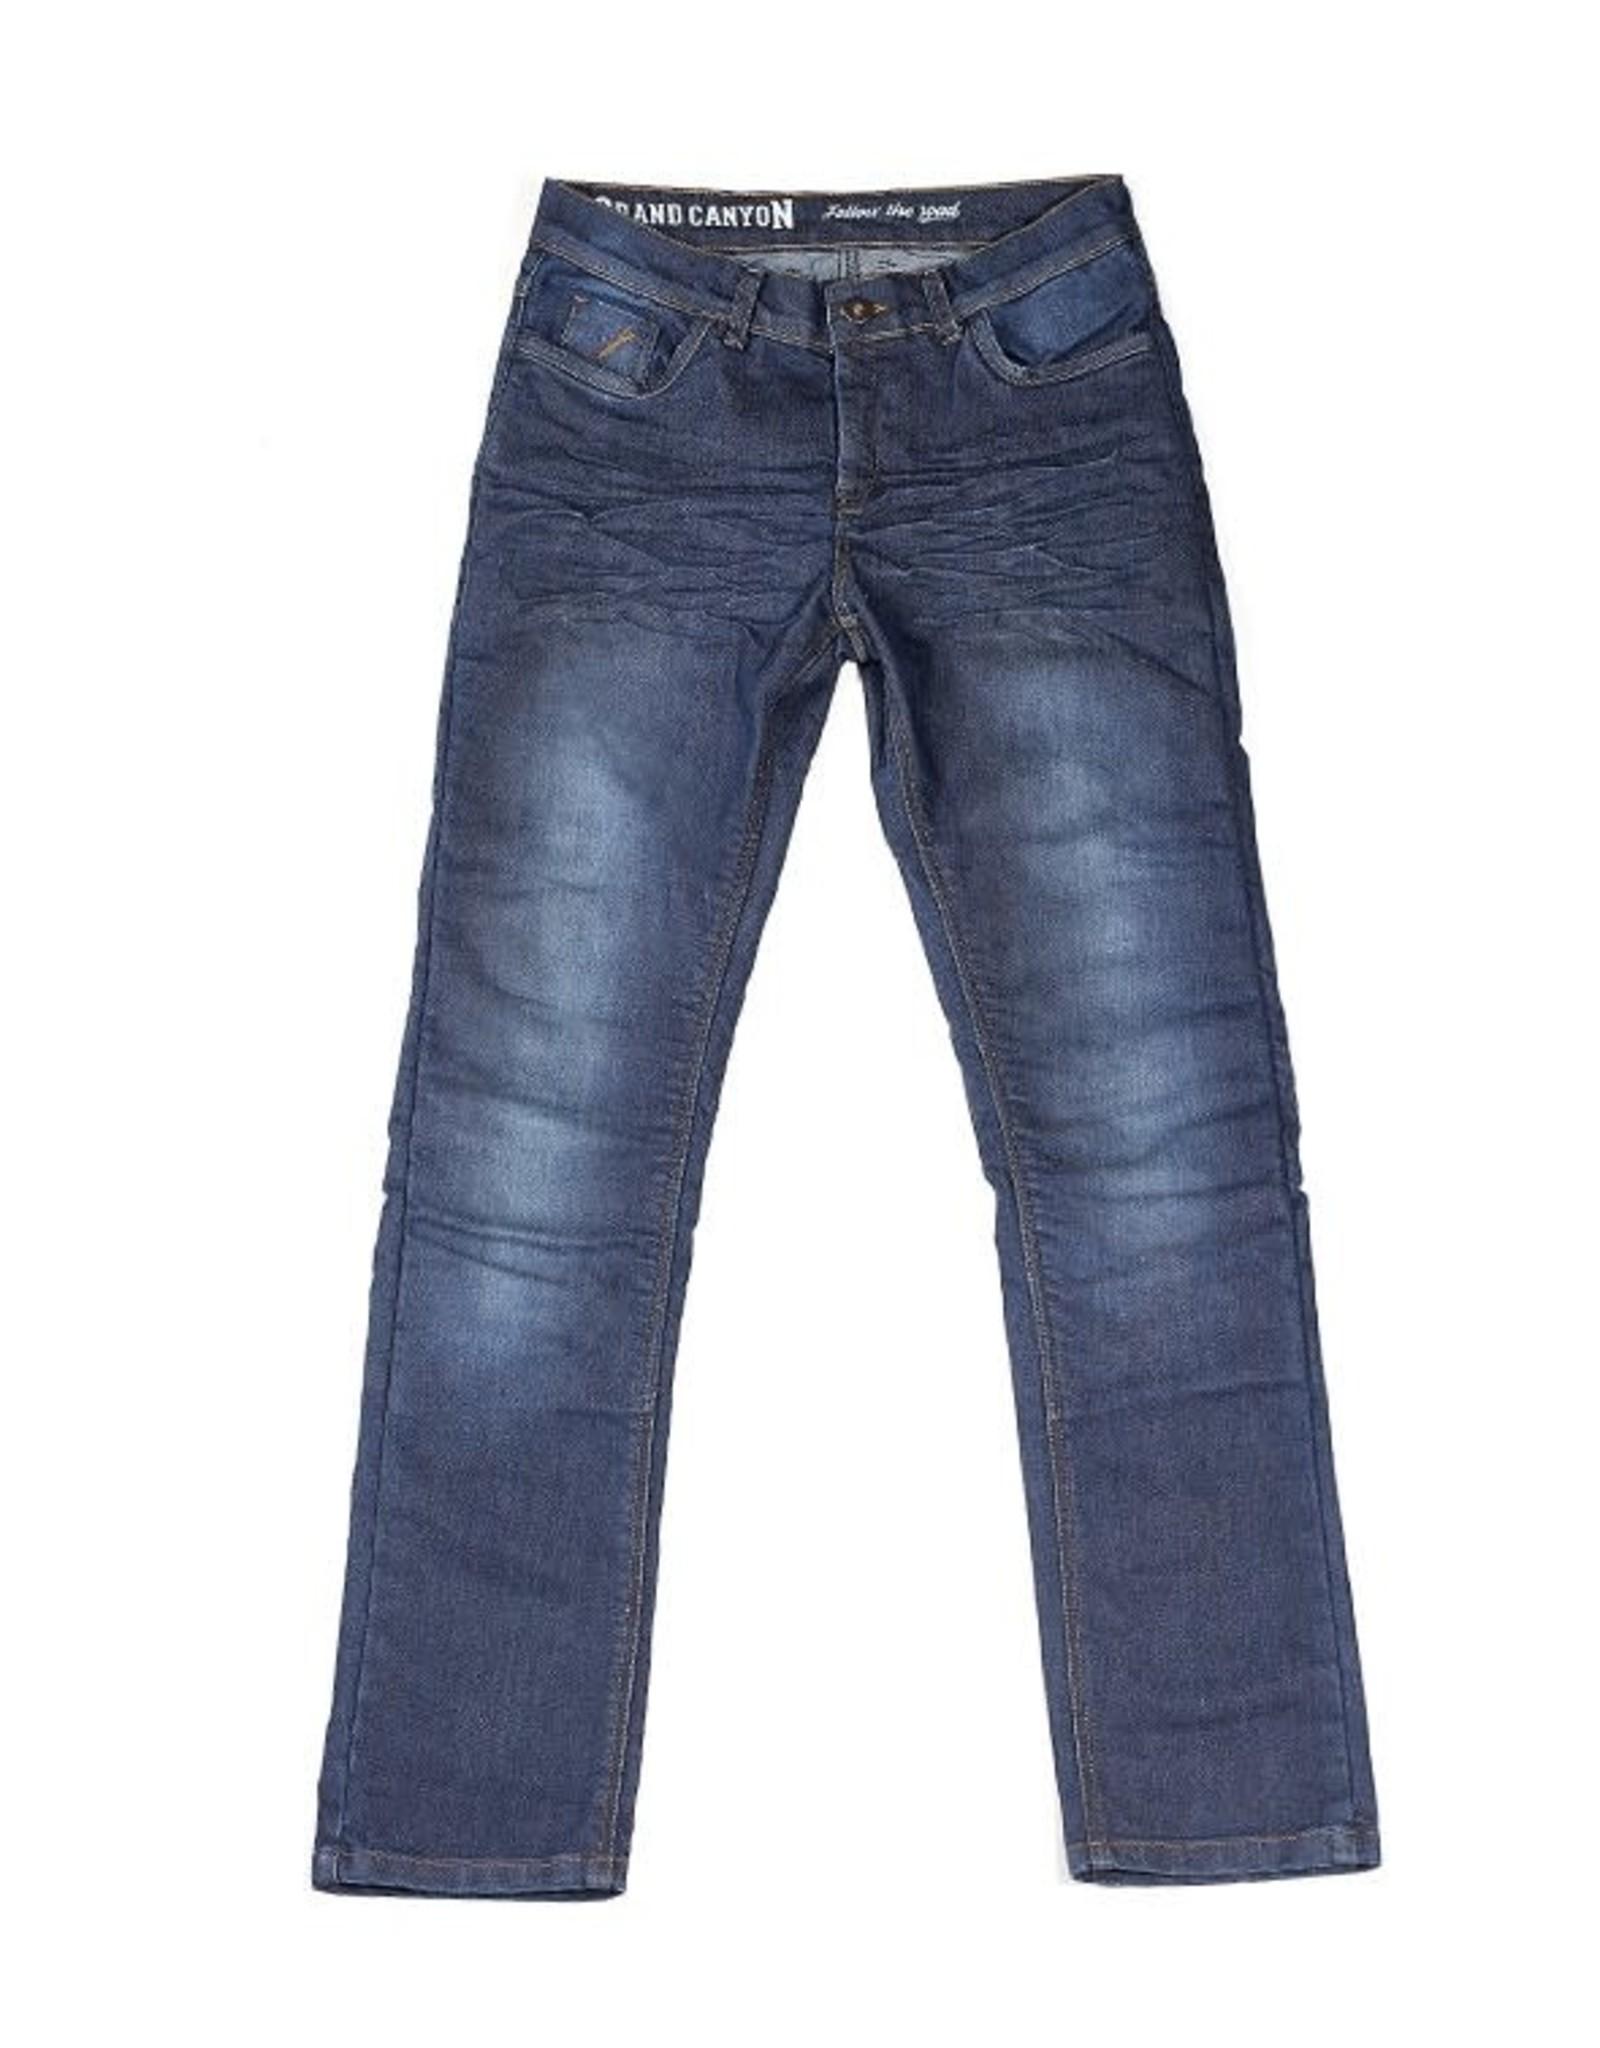 Grand Canyon Bikewear Grand Canyon Trigger Jeans